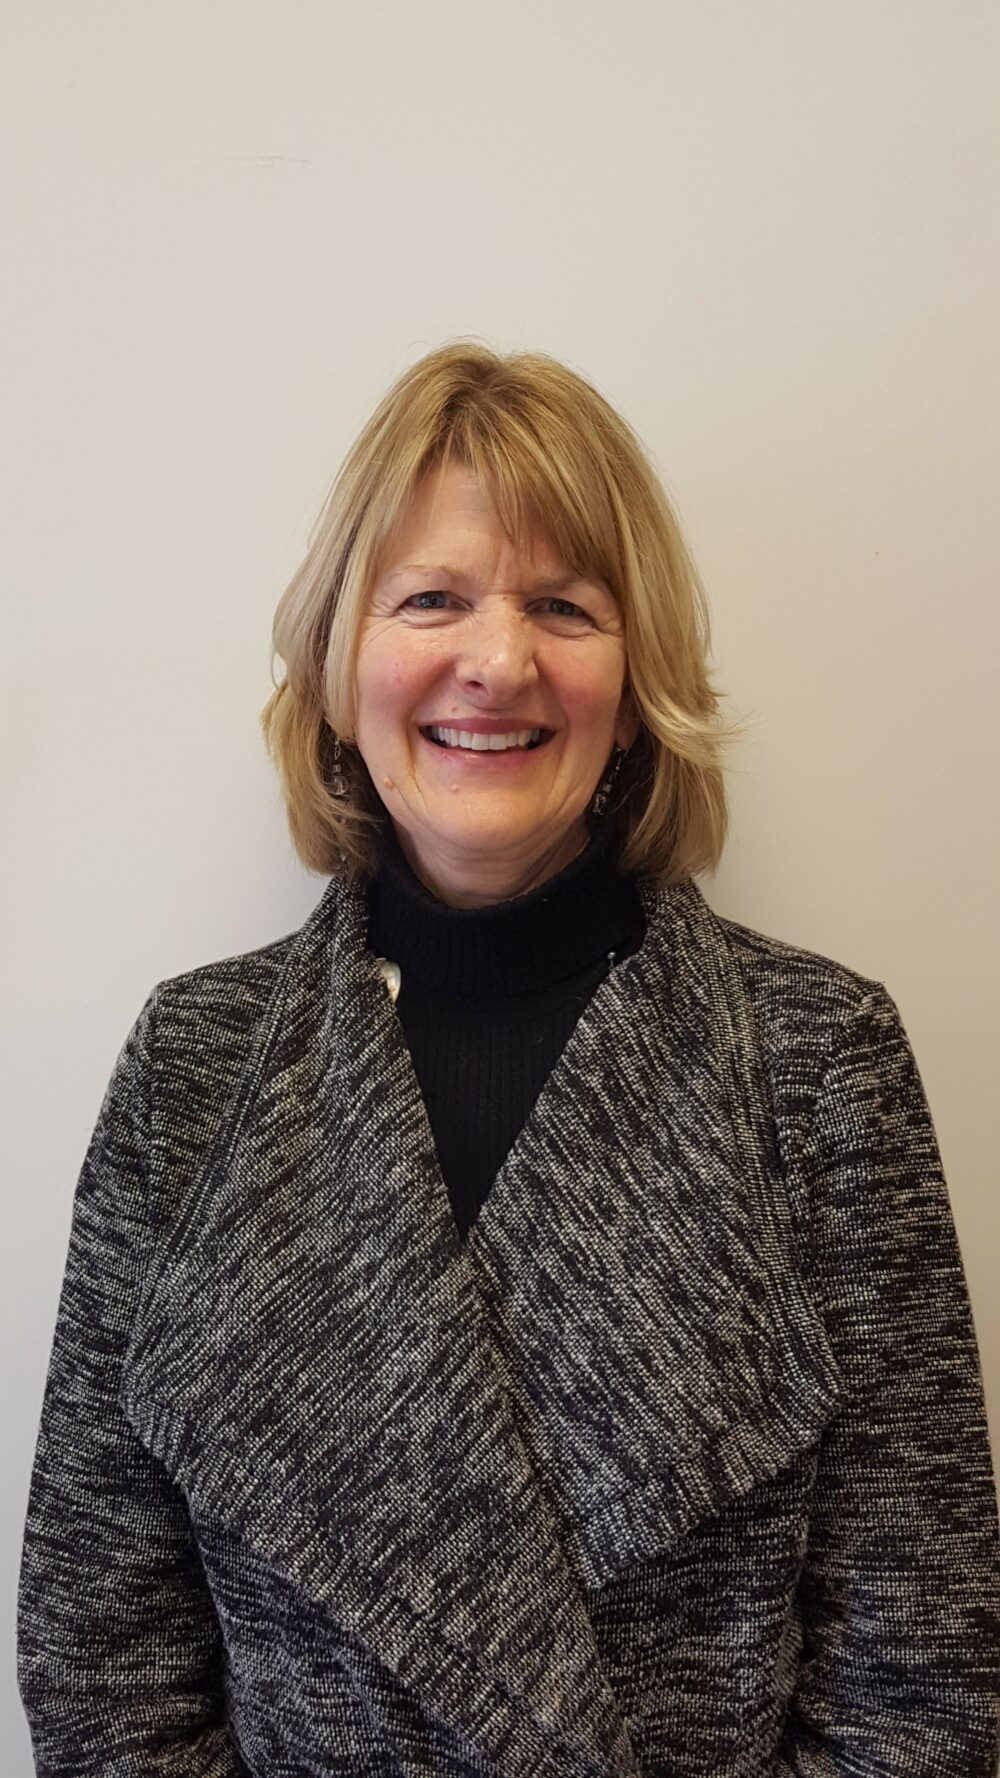 Maryellen Sheehan, M.B.A. Director of Operations